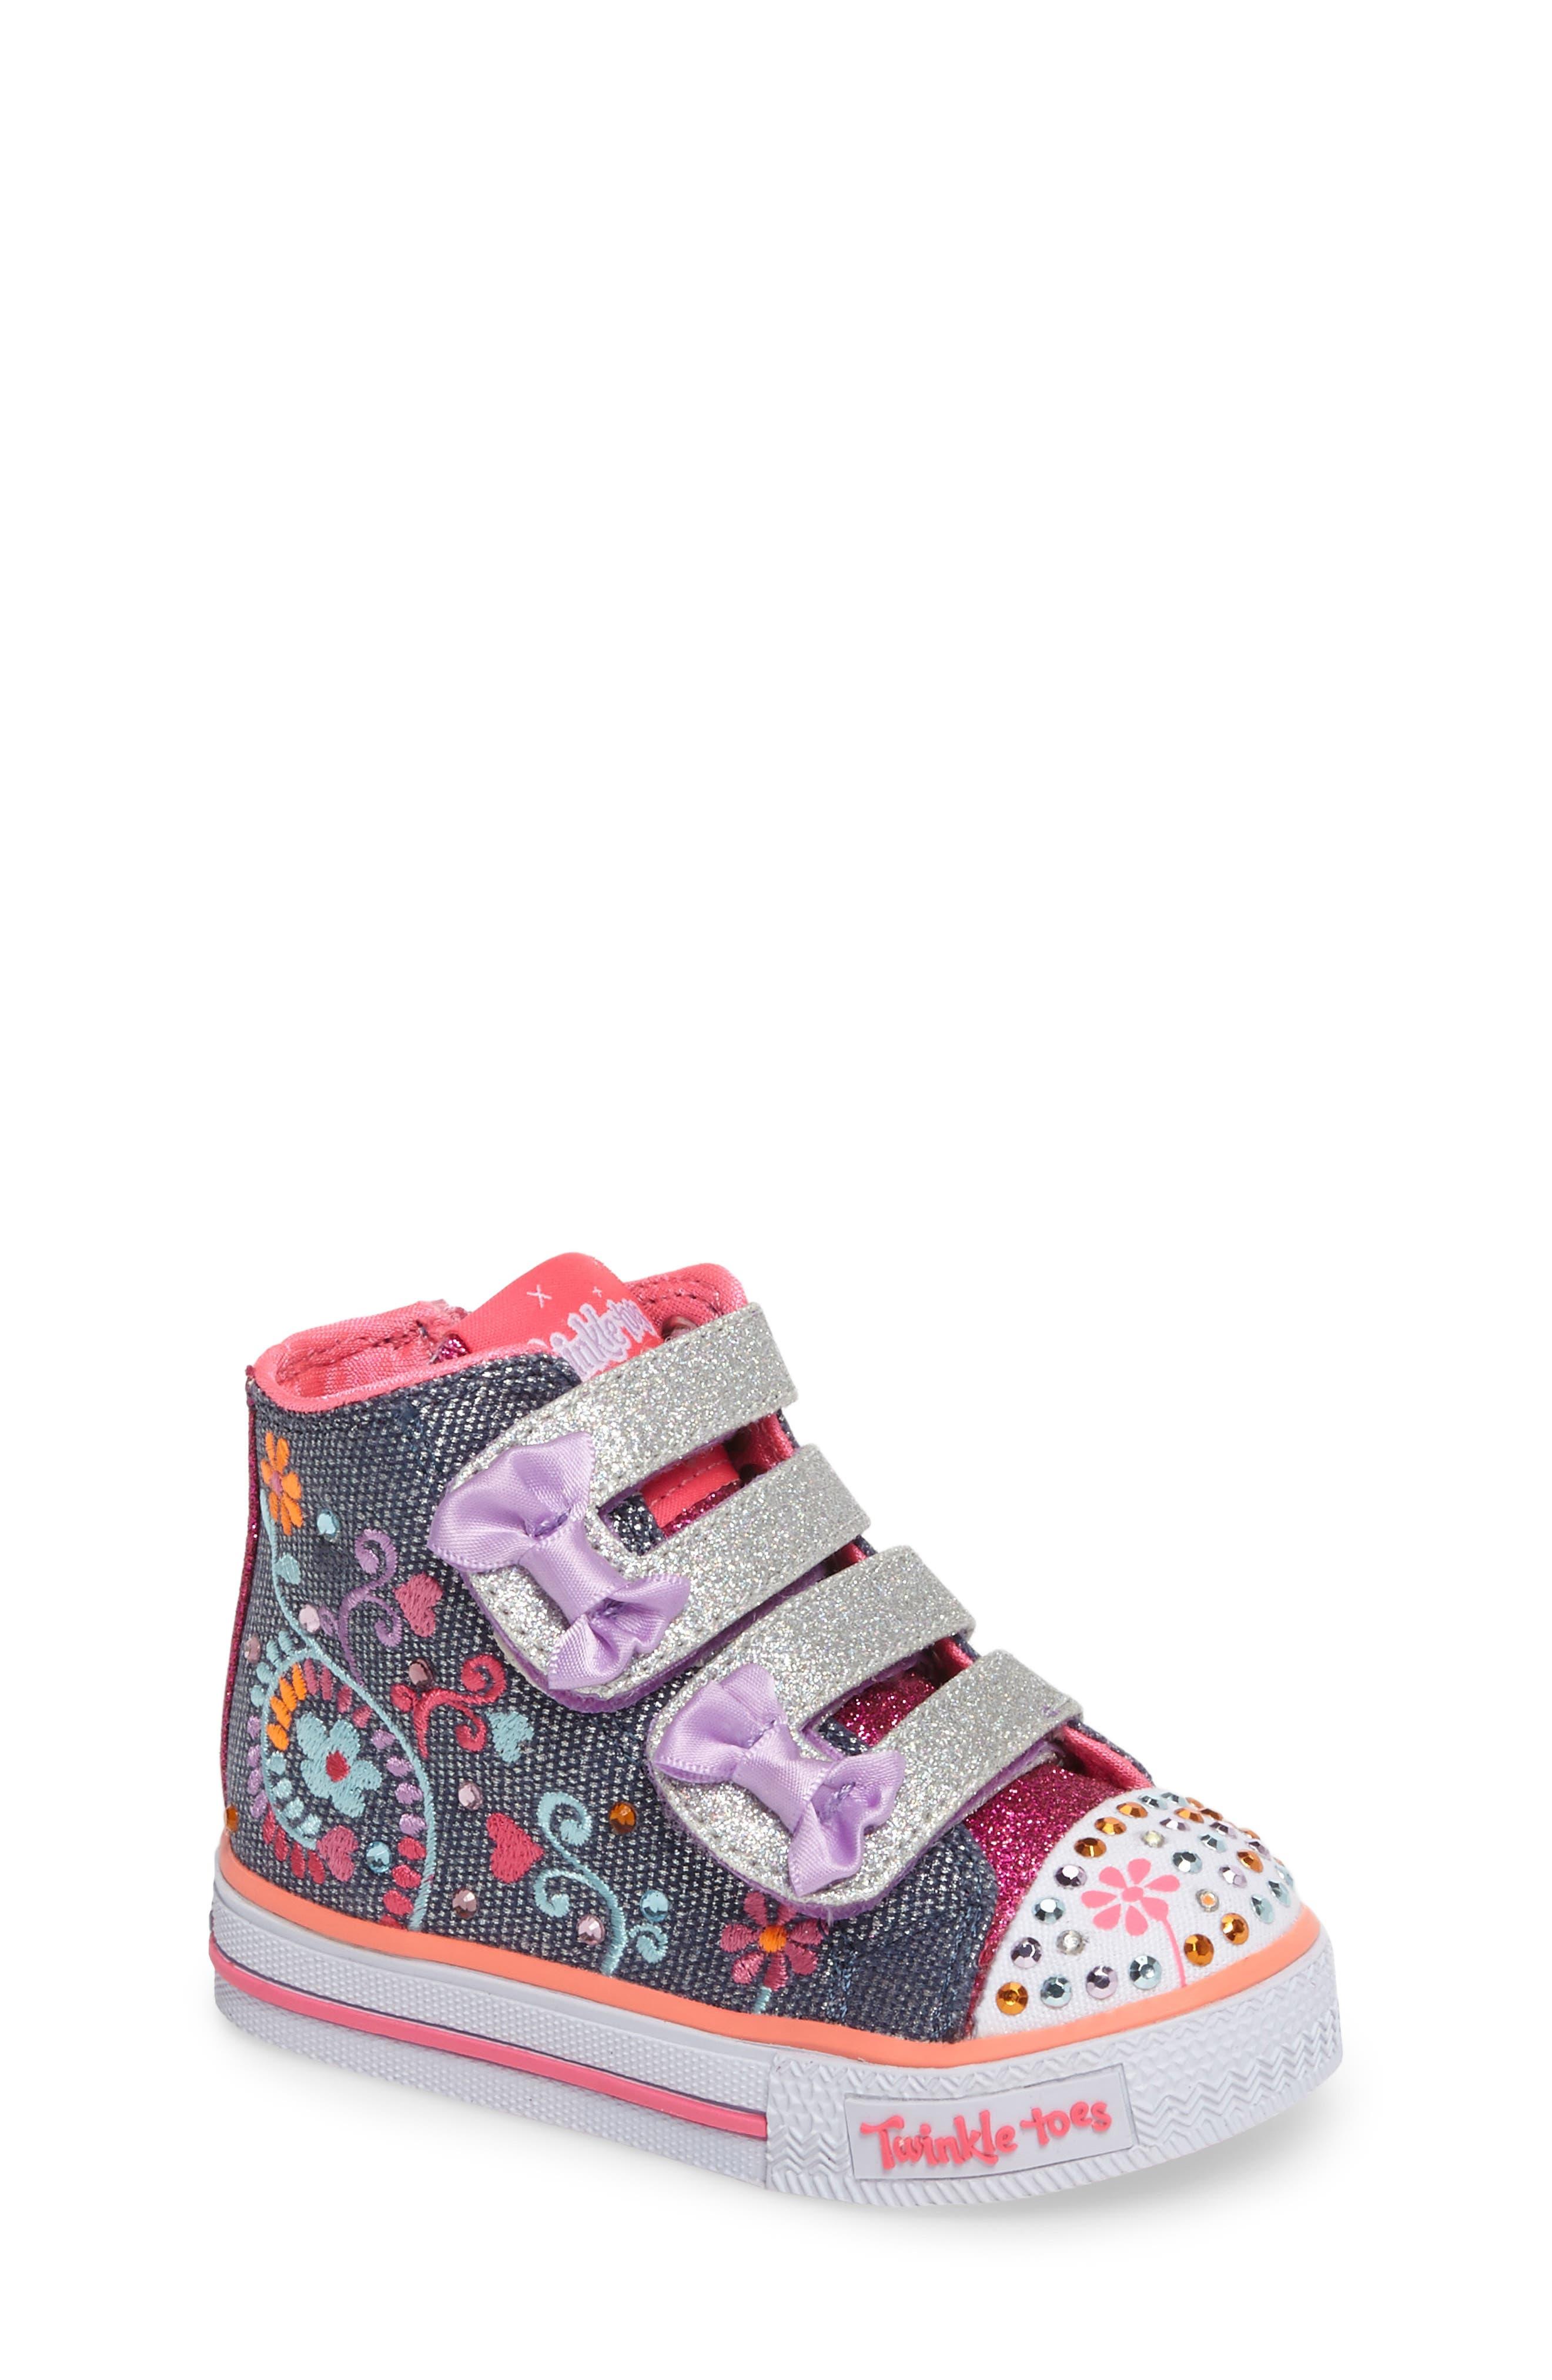 Shuffles Sneaker,                             Main thumbnail 1, color,                             468